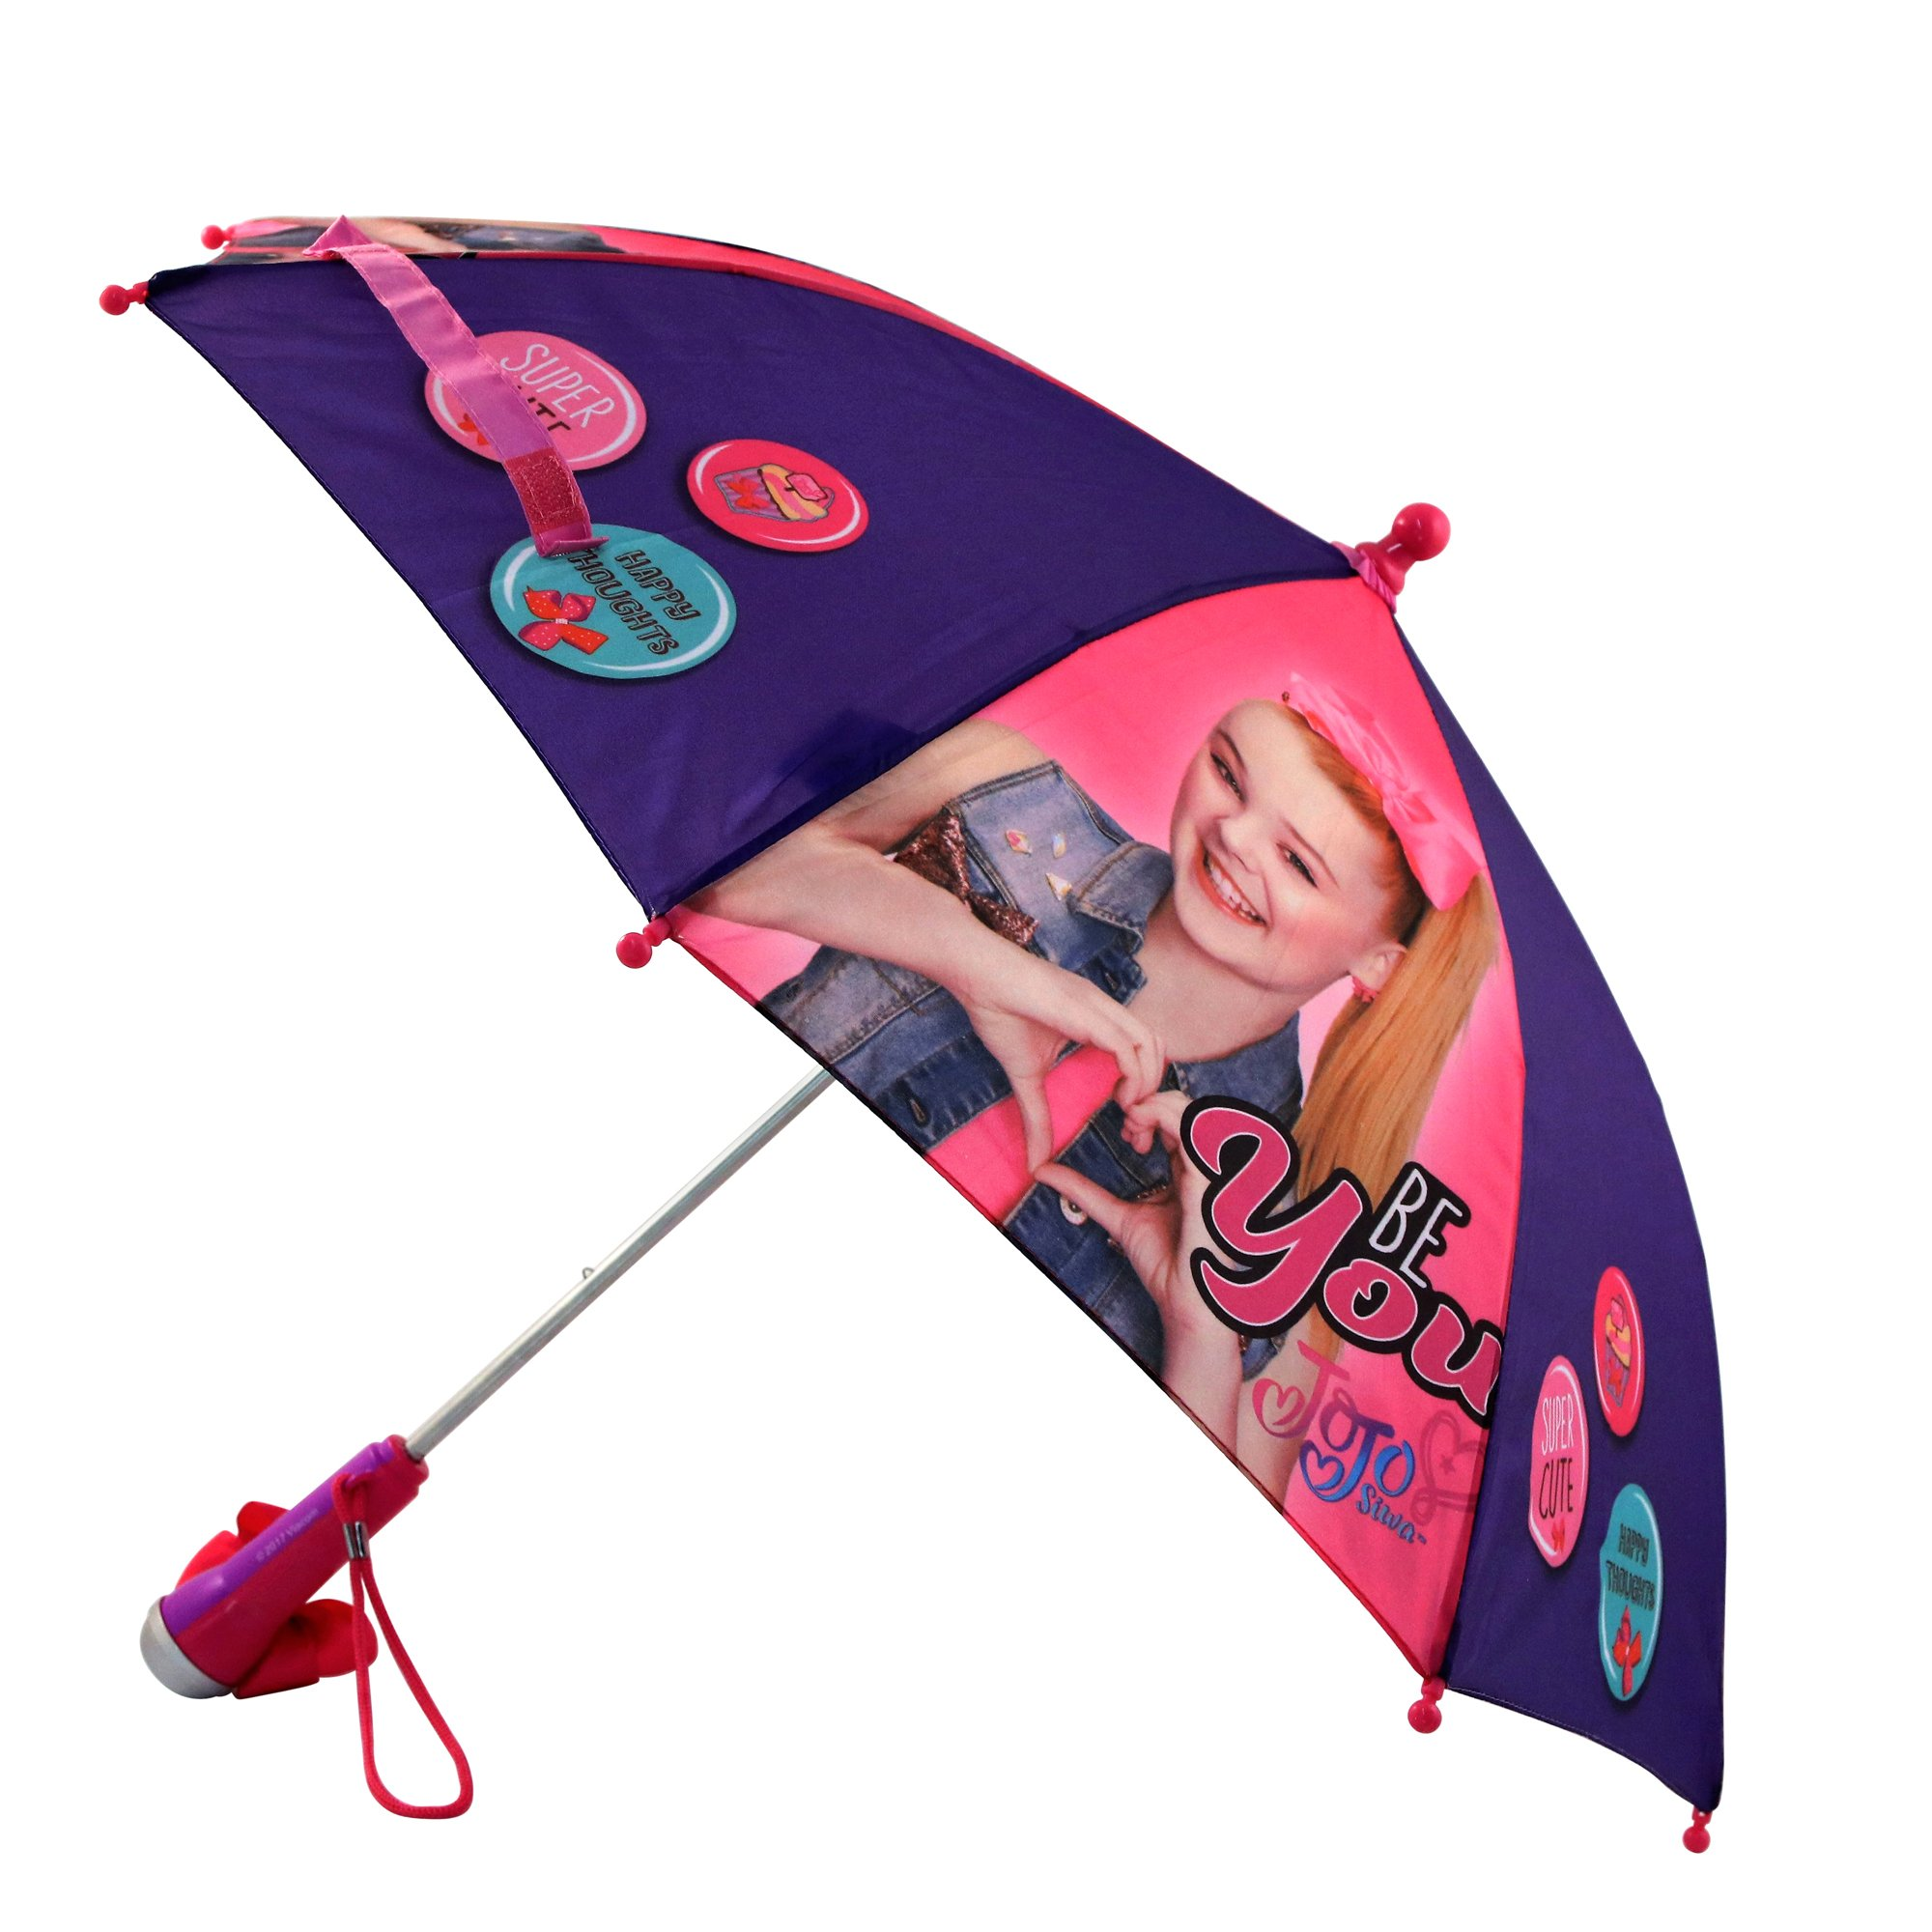 Nickelodeon Little Girls' Jojo Siwa Rainwear Character Umbrella, Purple/Pink, Age 3-7 by Nickelodeon (Image #4)